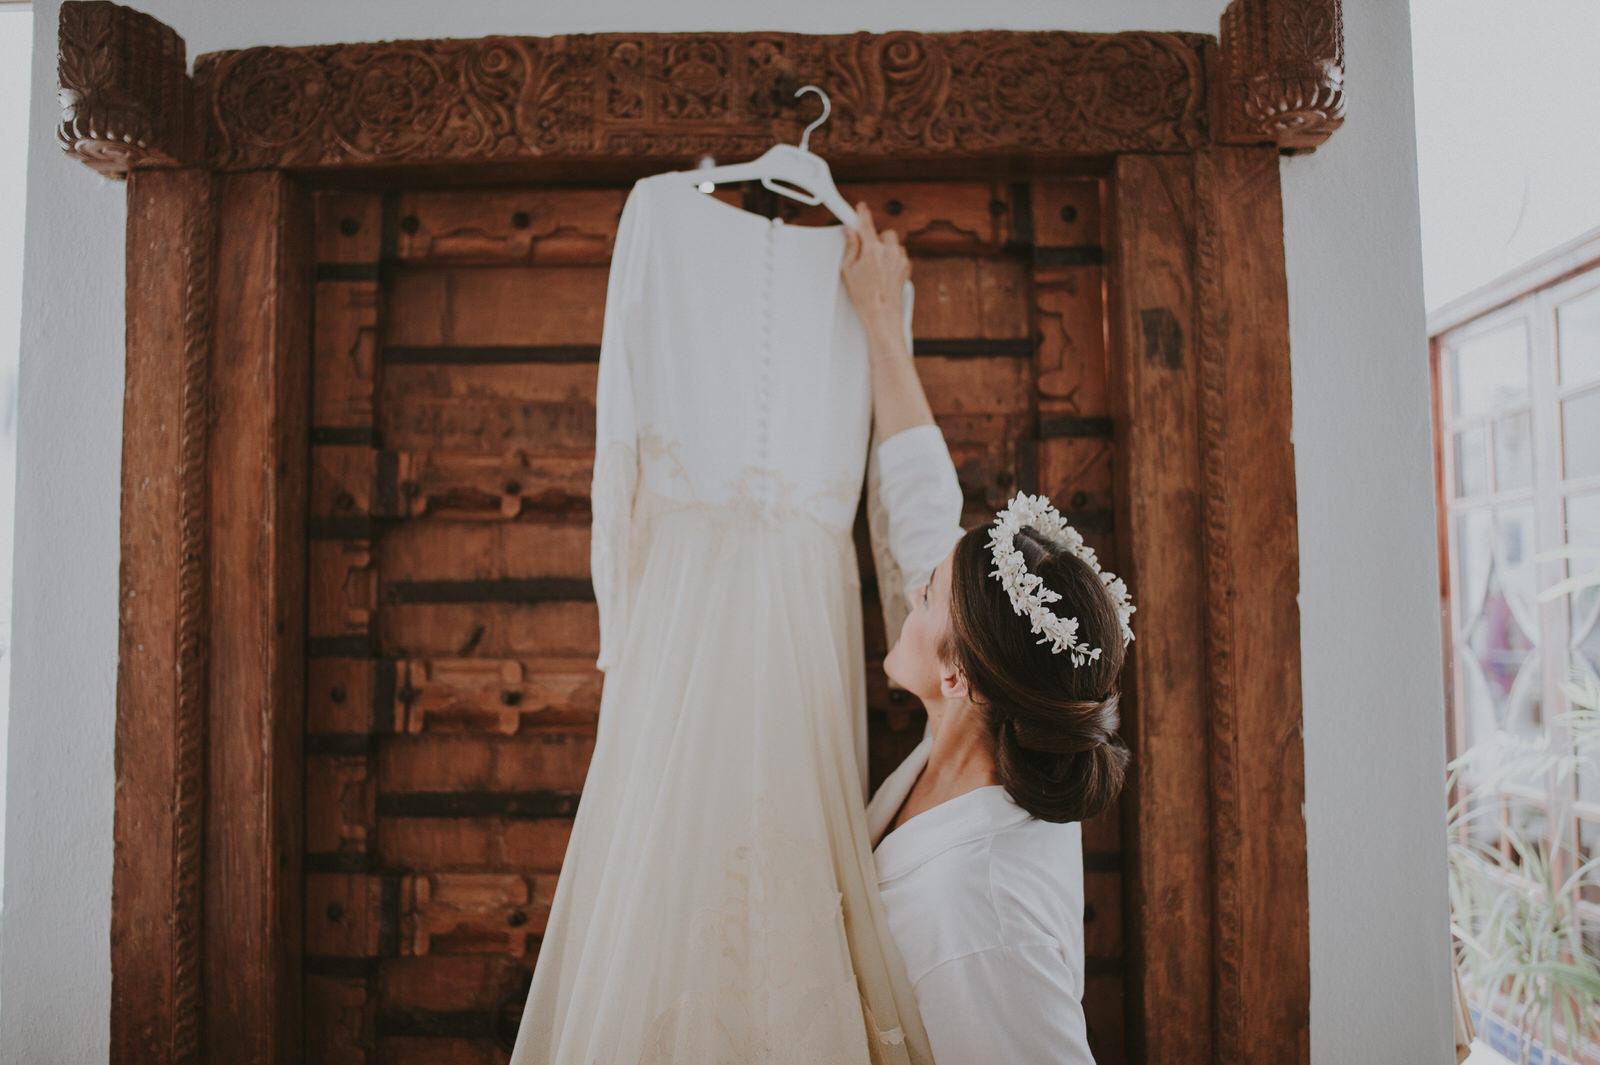 Judith & Gabriel - Boda en Olivares - Albaida, Fotógrafo de boda Andrés Amarillo - 9.JPG